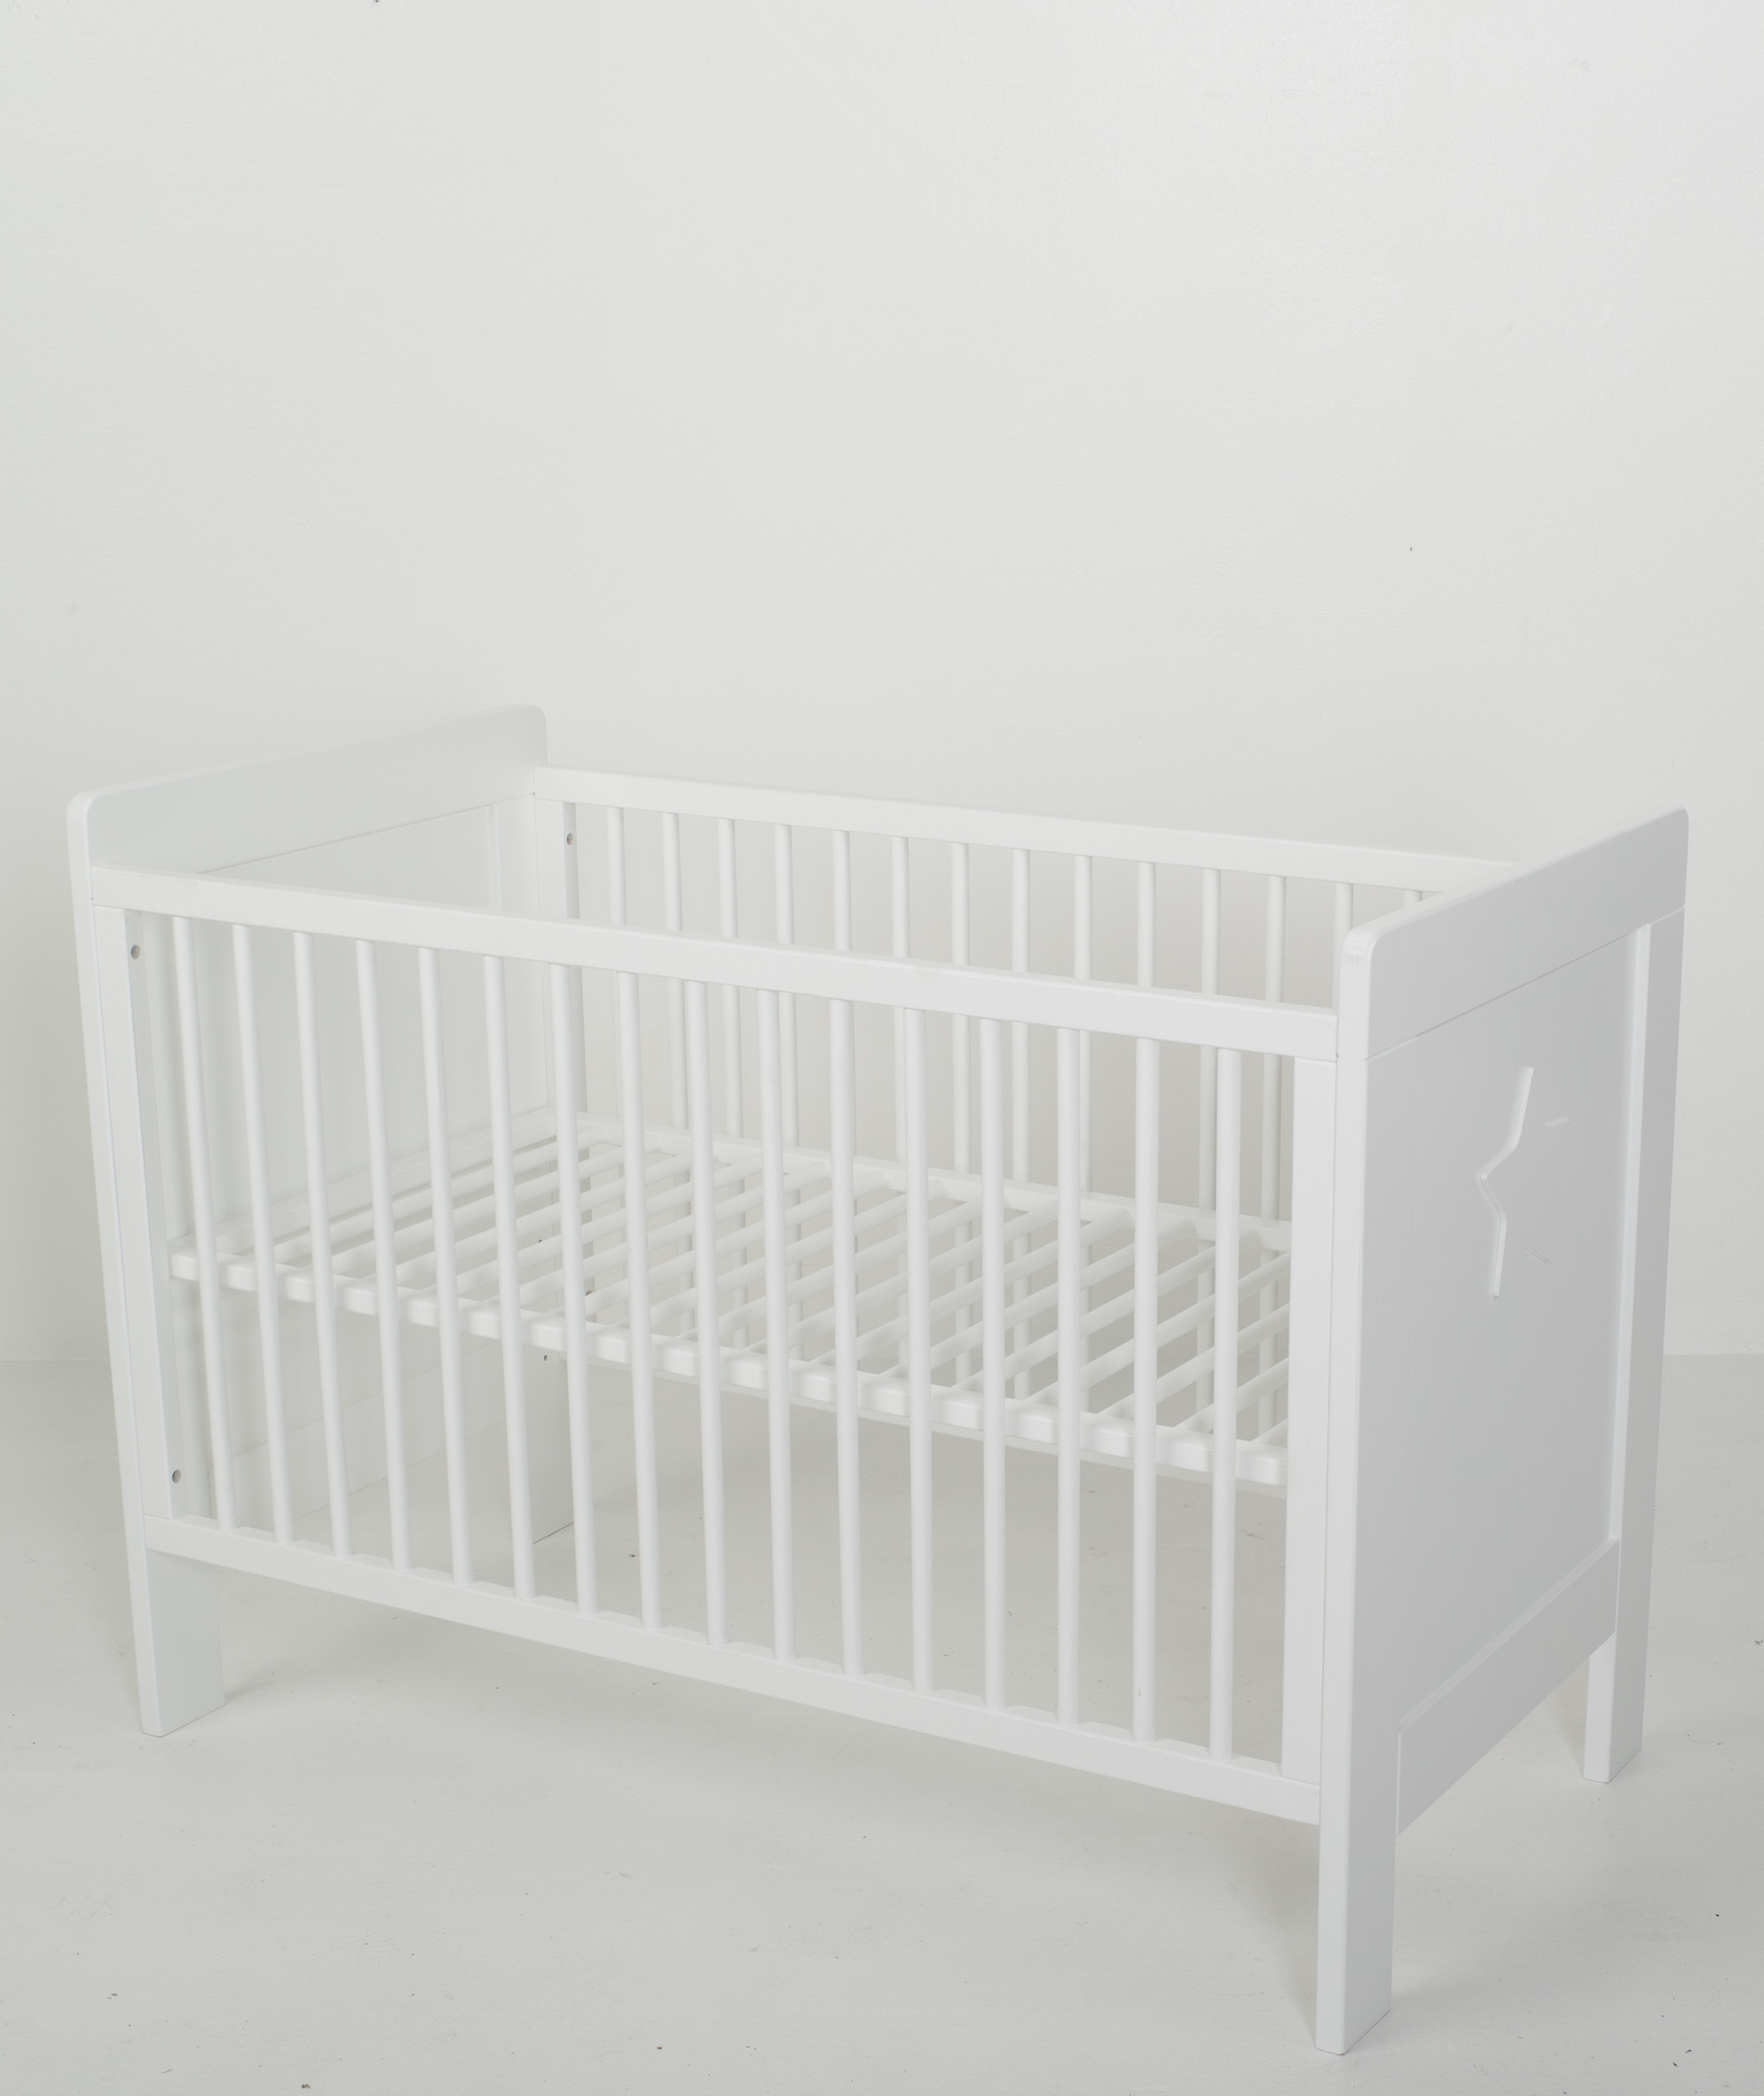 lit b b star quax chez tendre amour. Black Bedroom Furniture Sets. Home Design Ideas